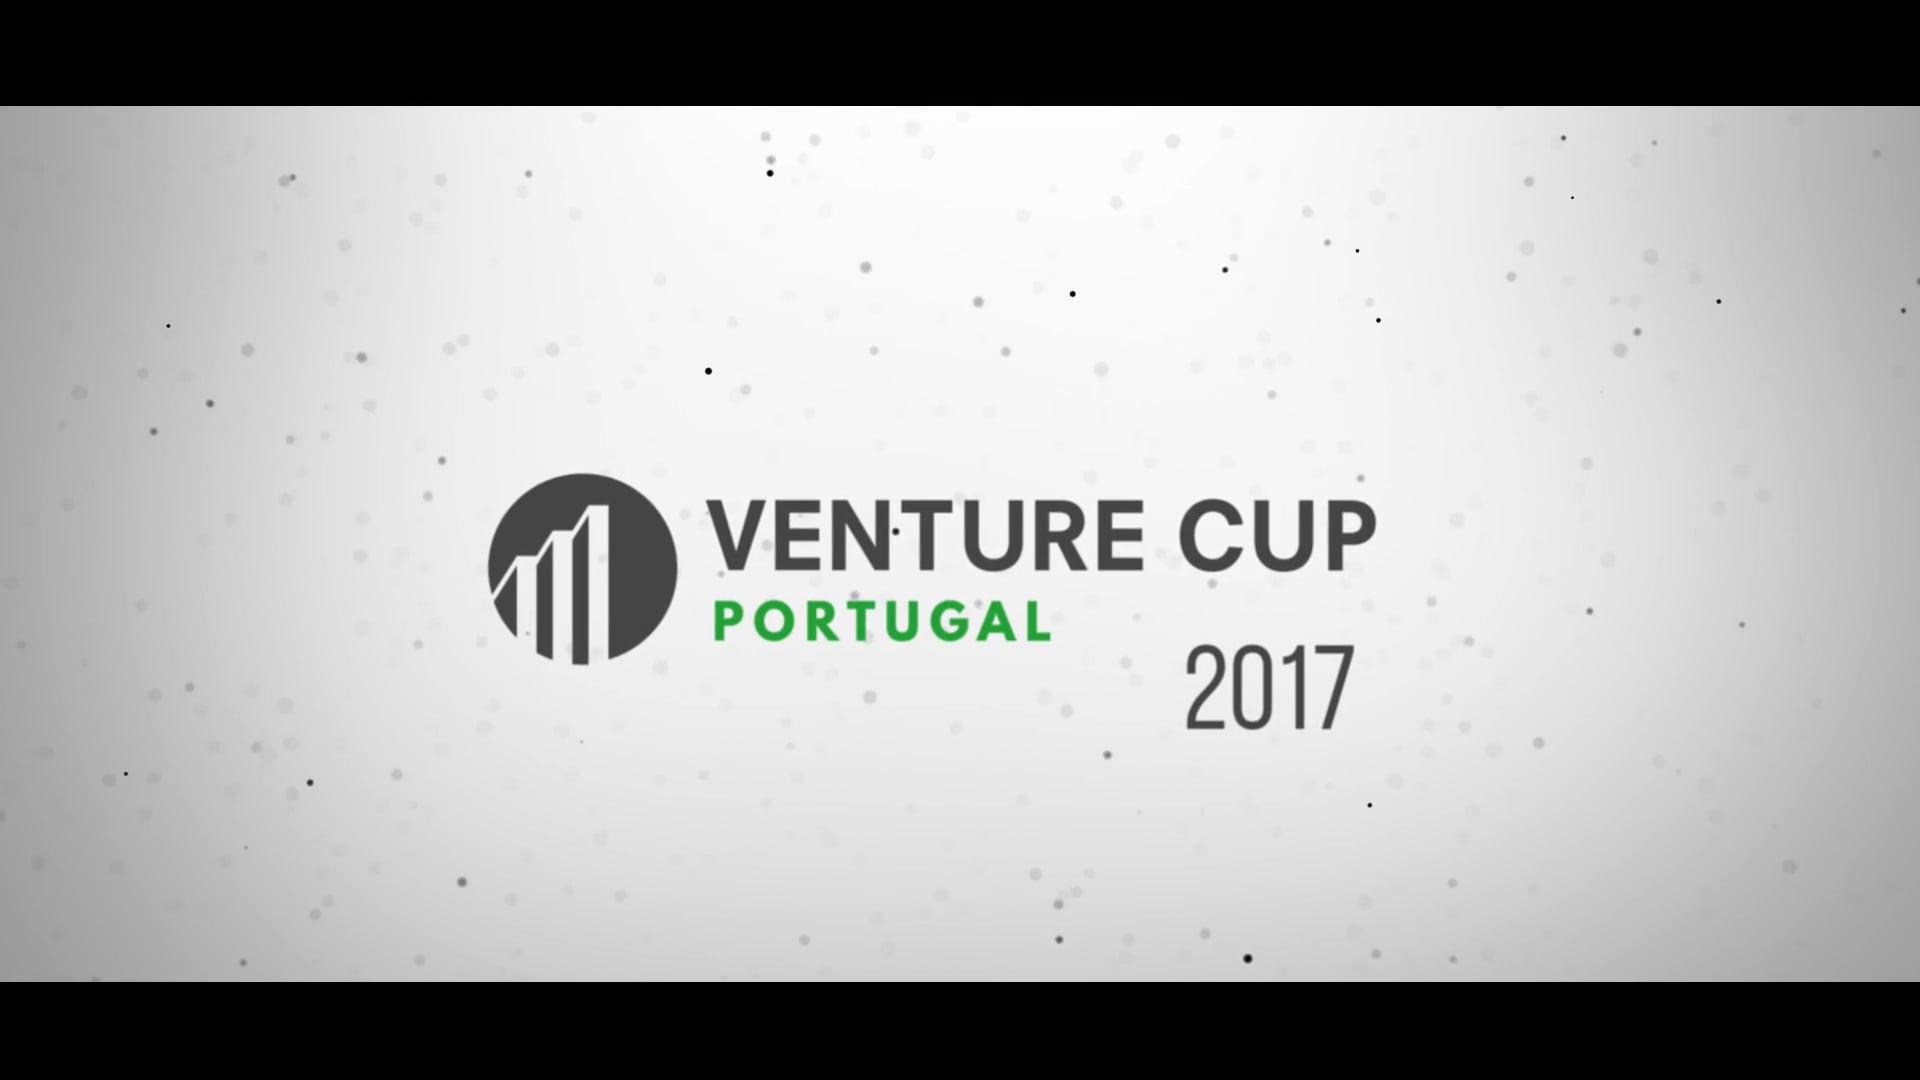 Venture Cup Portugal 2017 - Promo